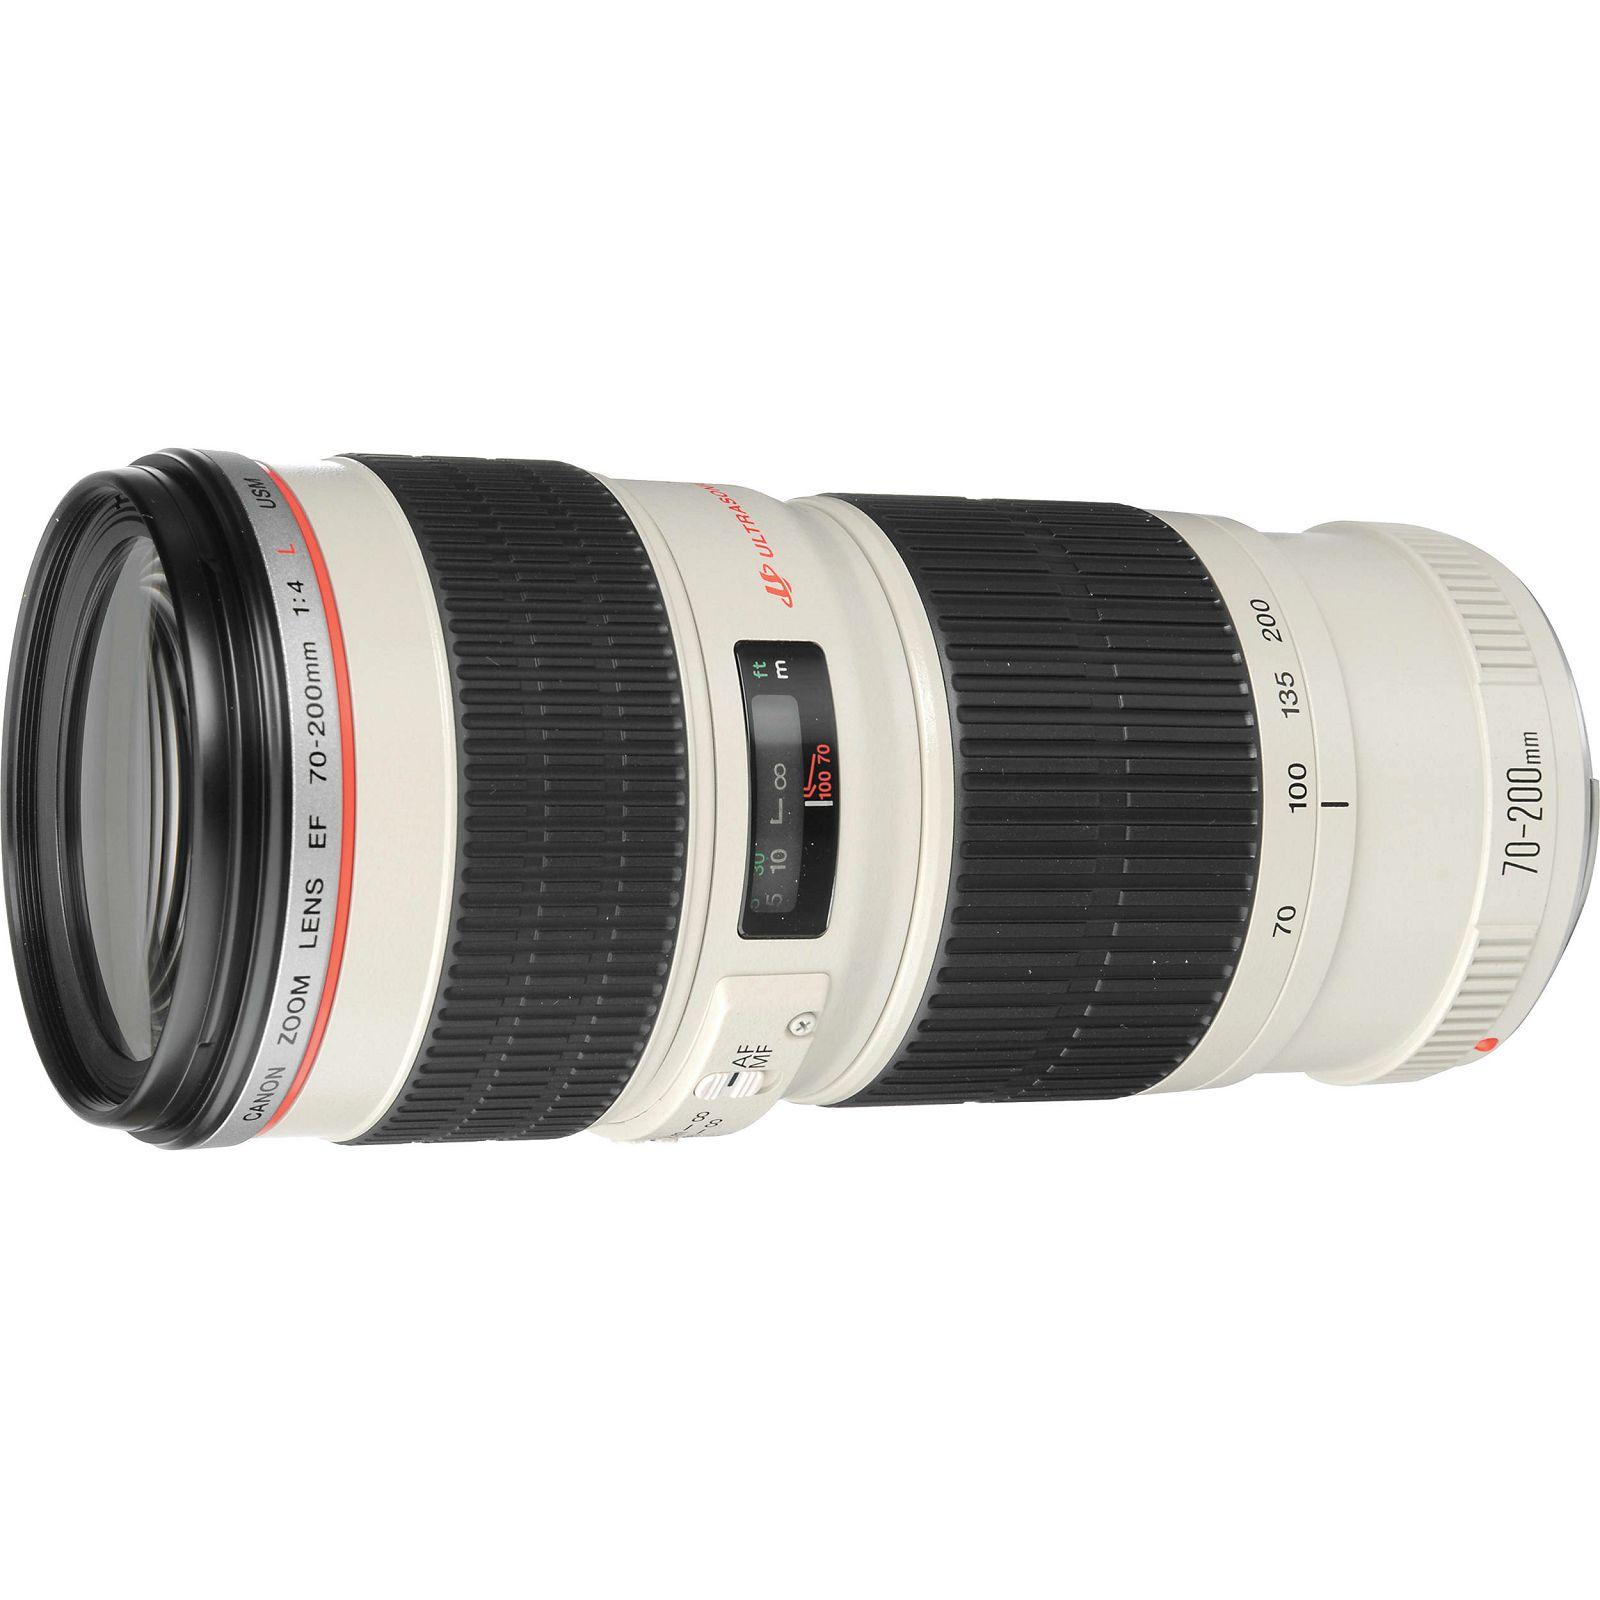 Canon EF 70-200mm f/4 L USM telefoto objektiv zoom lens 70-200 F4 4.0 1:4,0L f/4L F/4.0 (2578A009AA) - CASH BACK promocija povrat novca u iznosu 370 kn